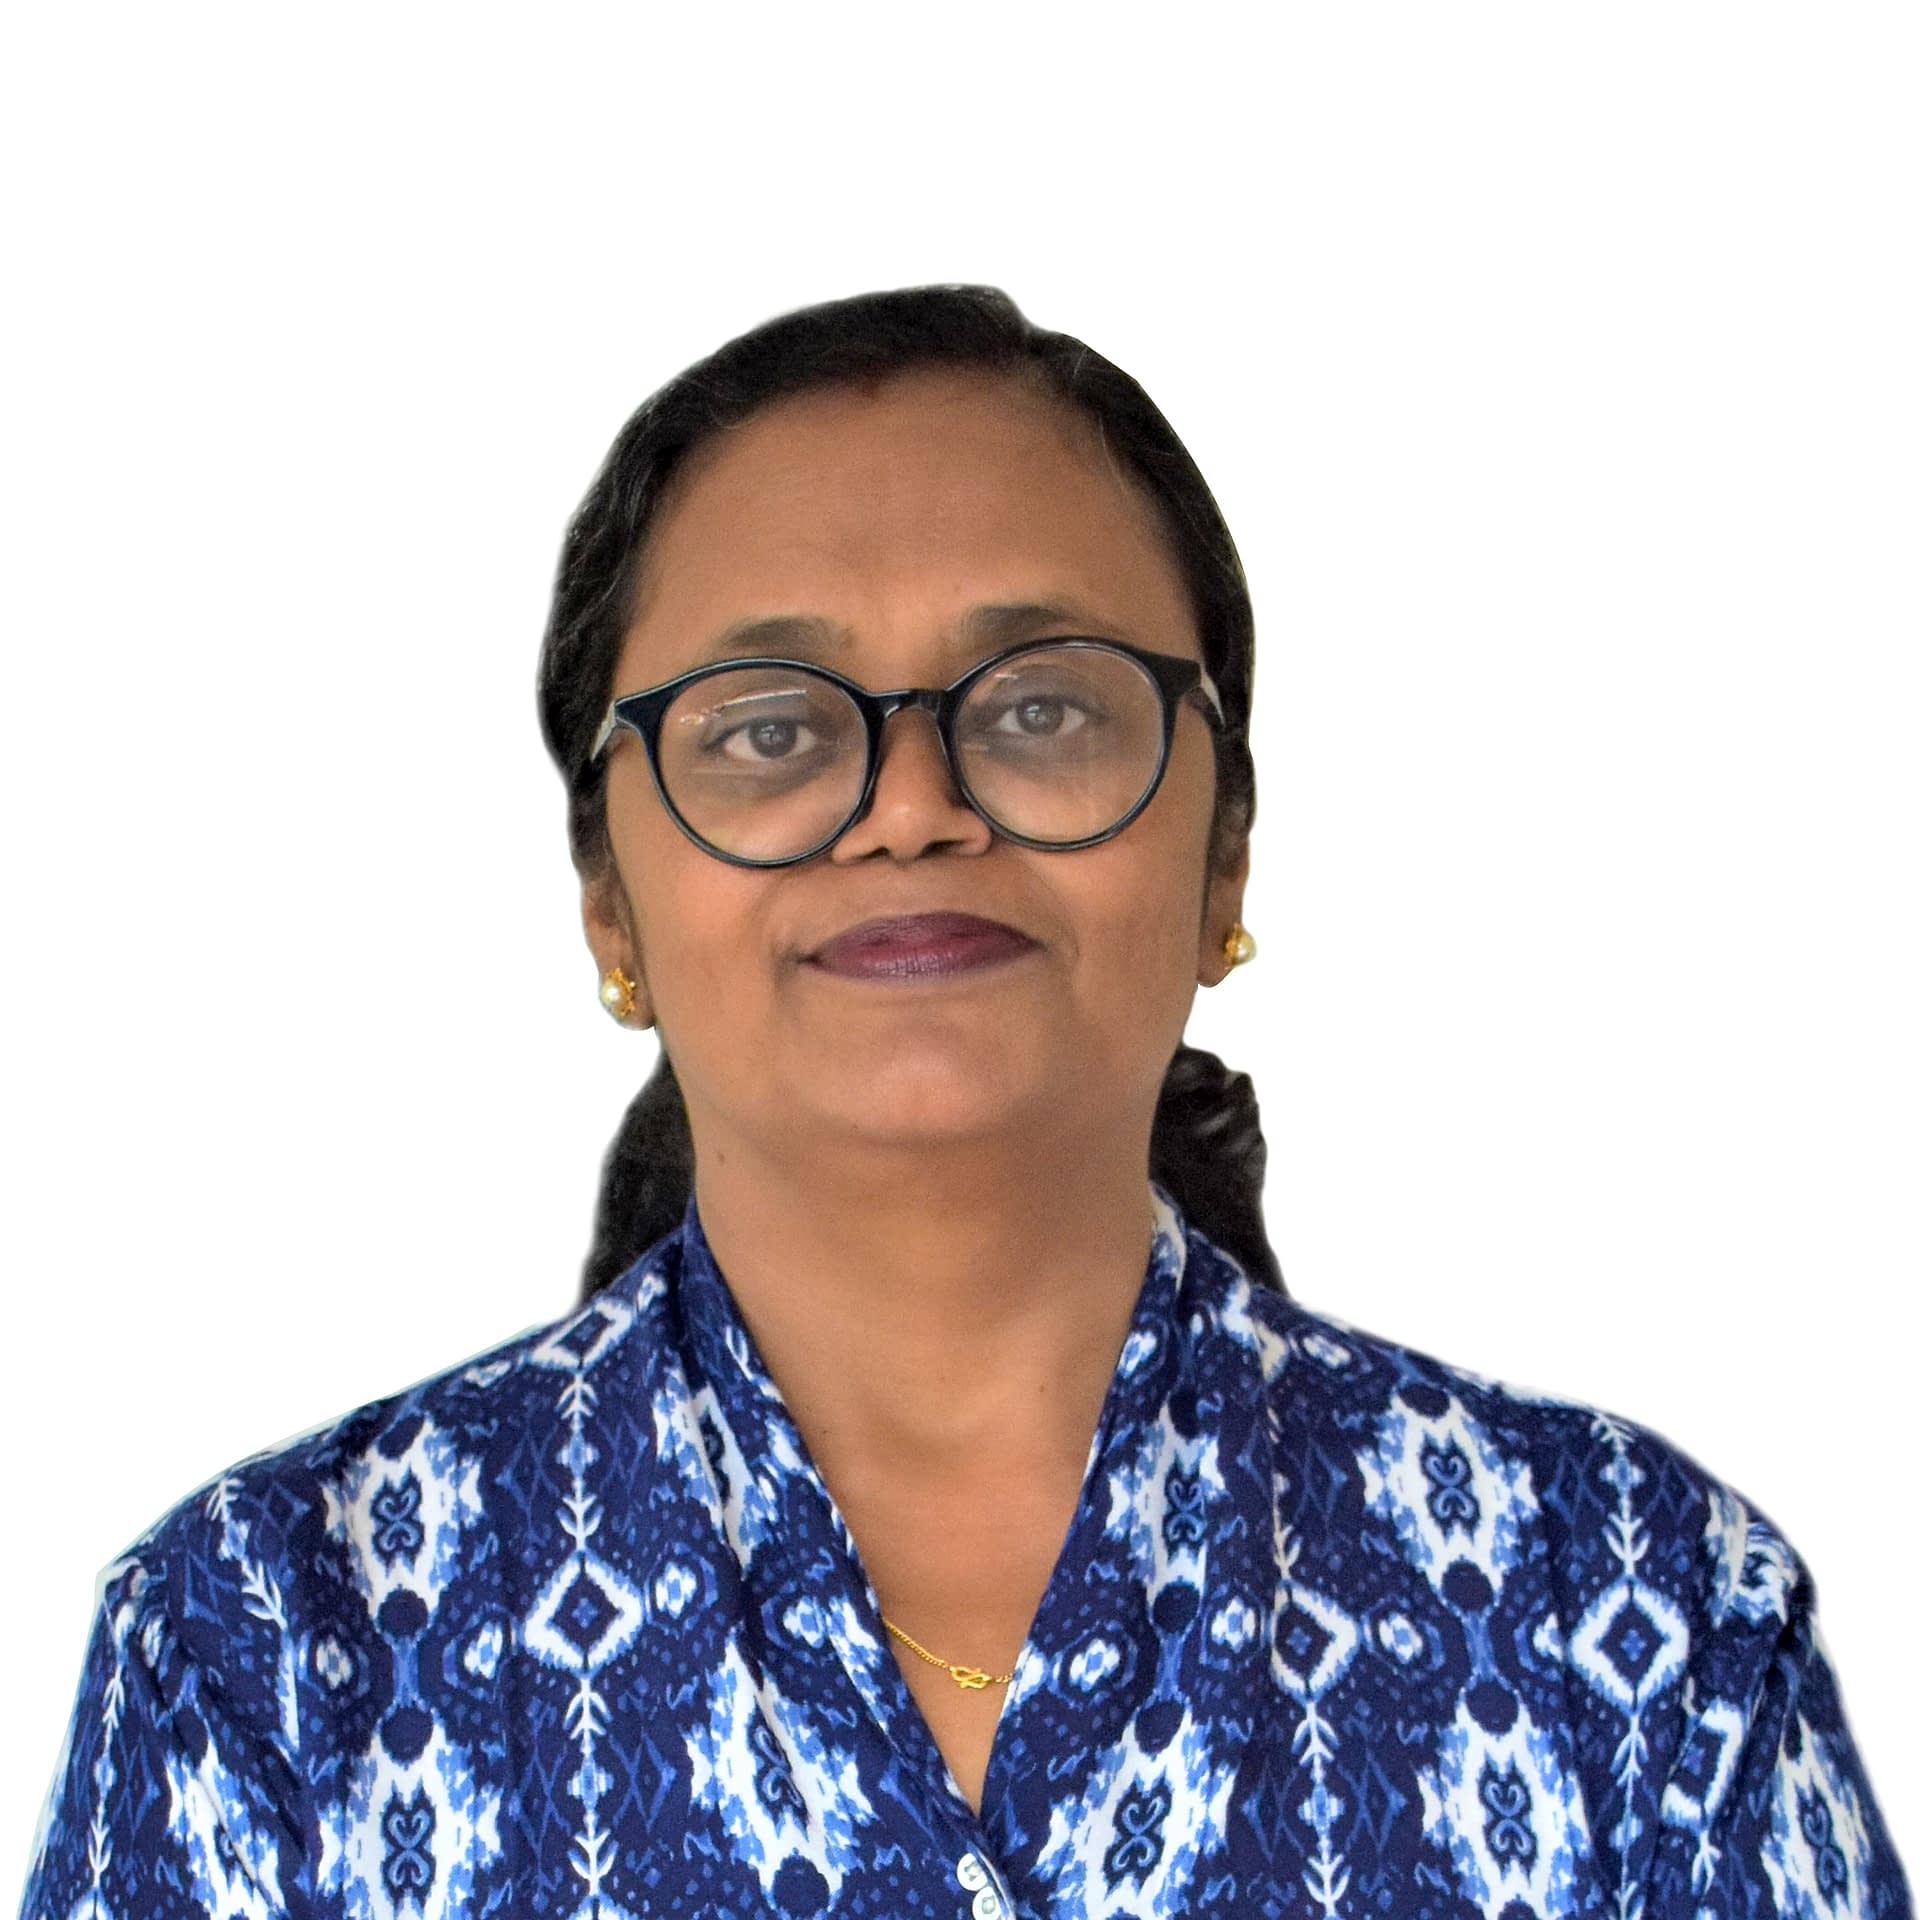 Profile image for Aparna Das